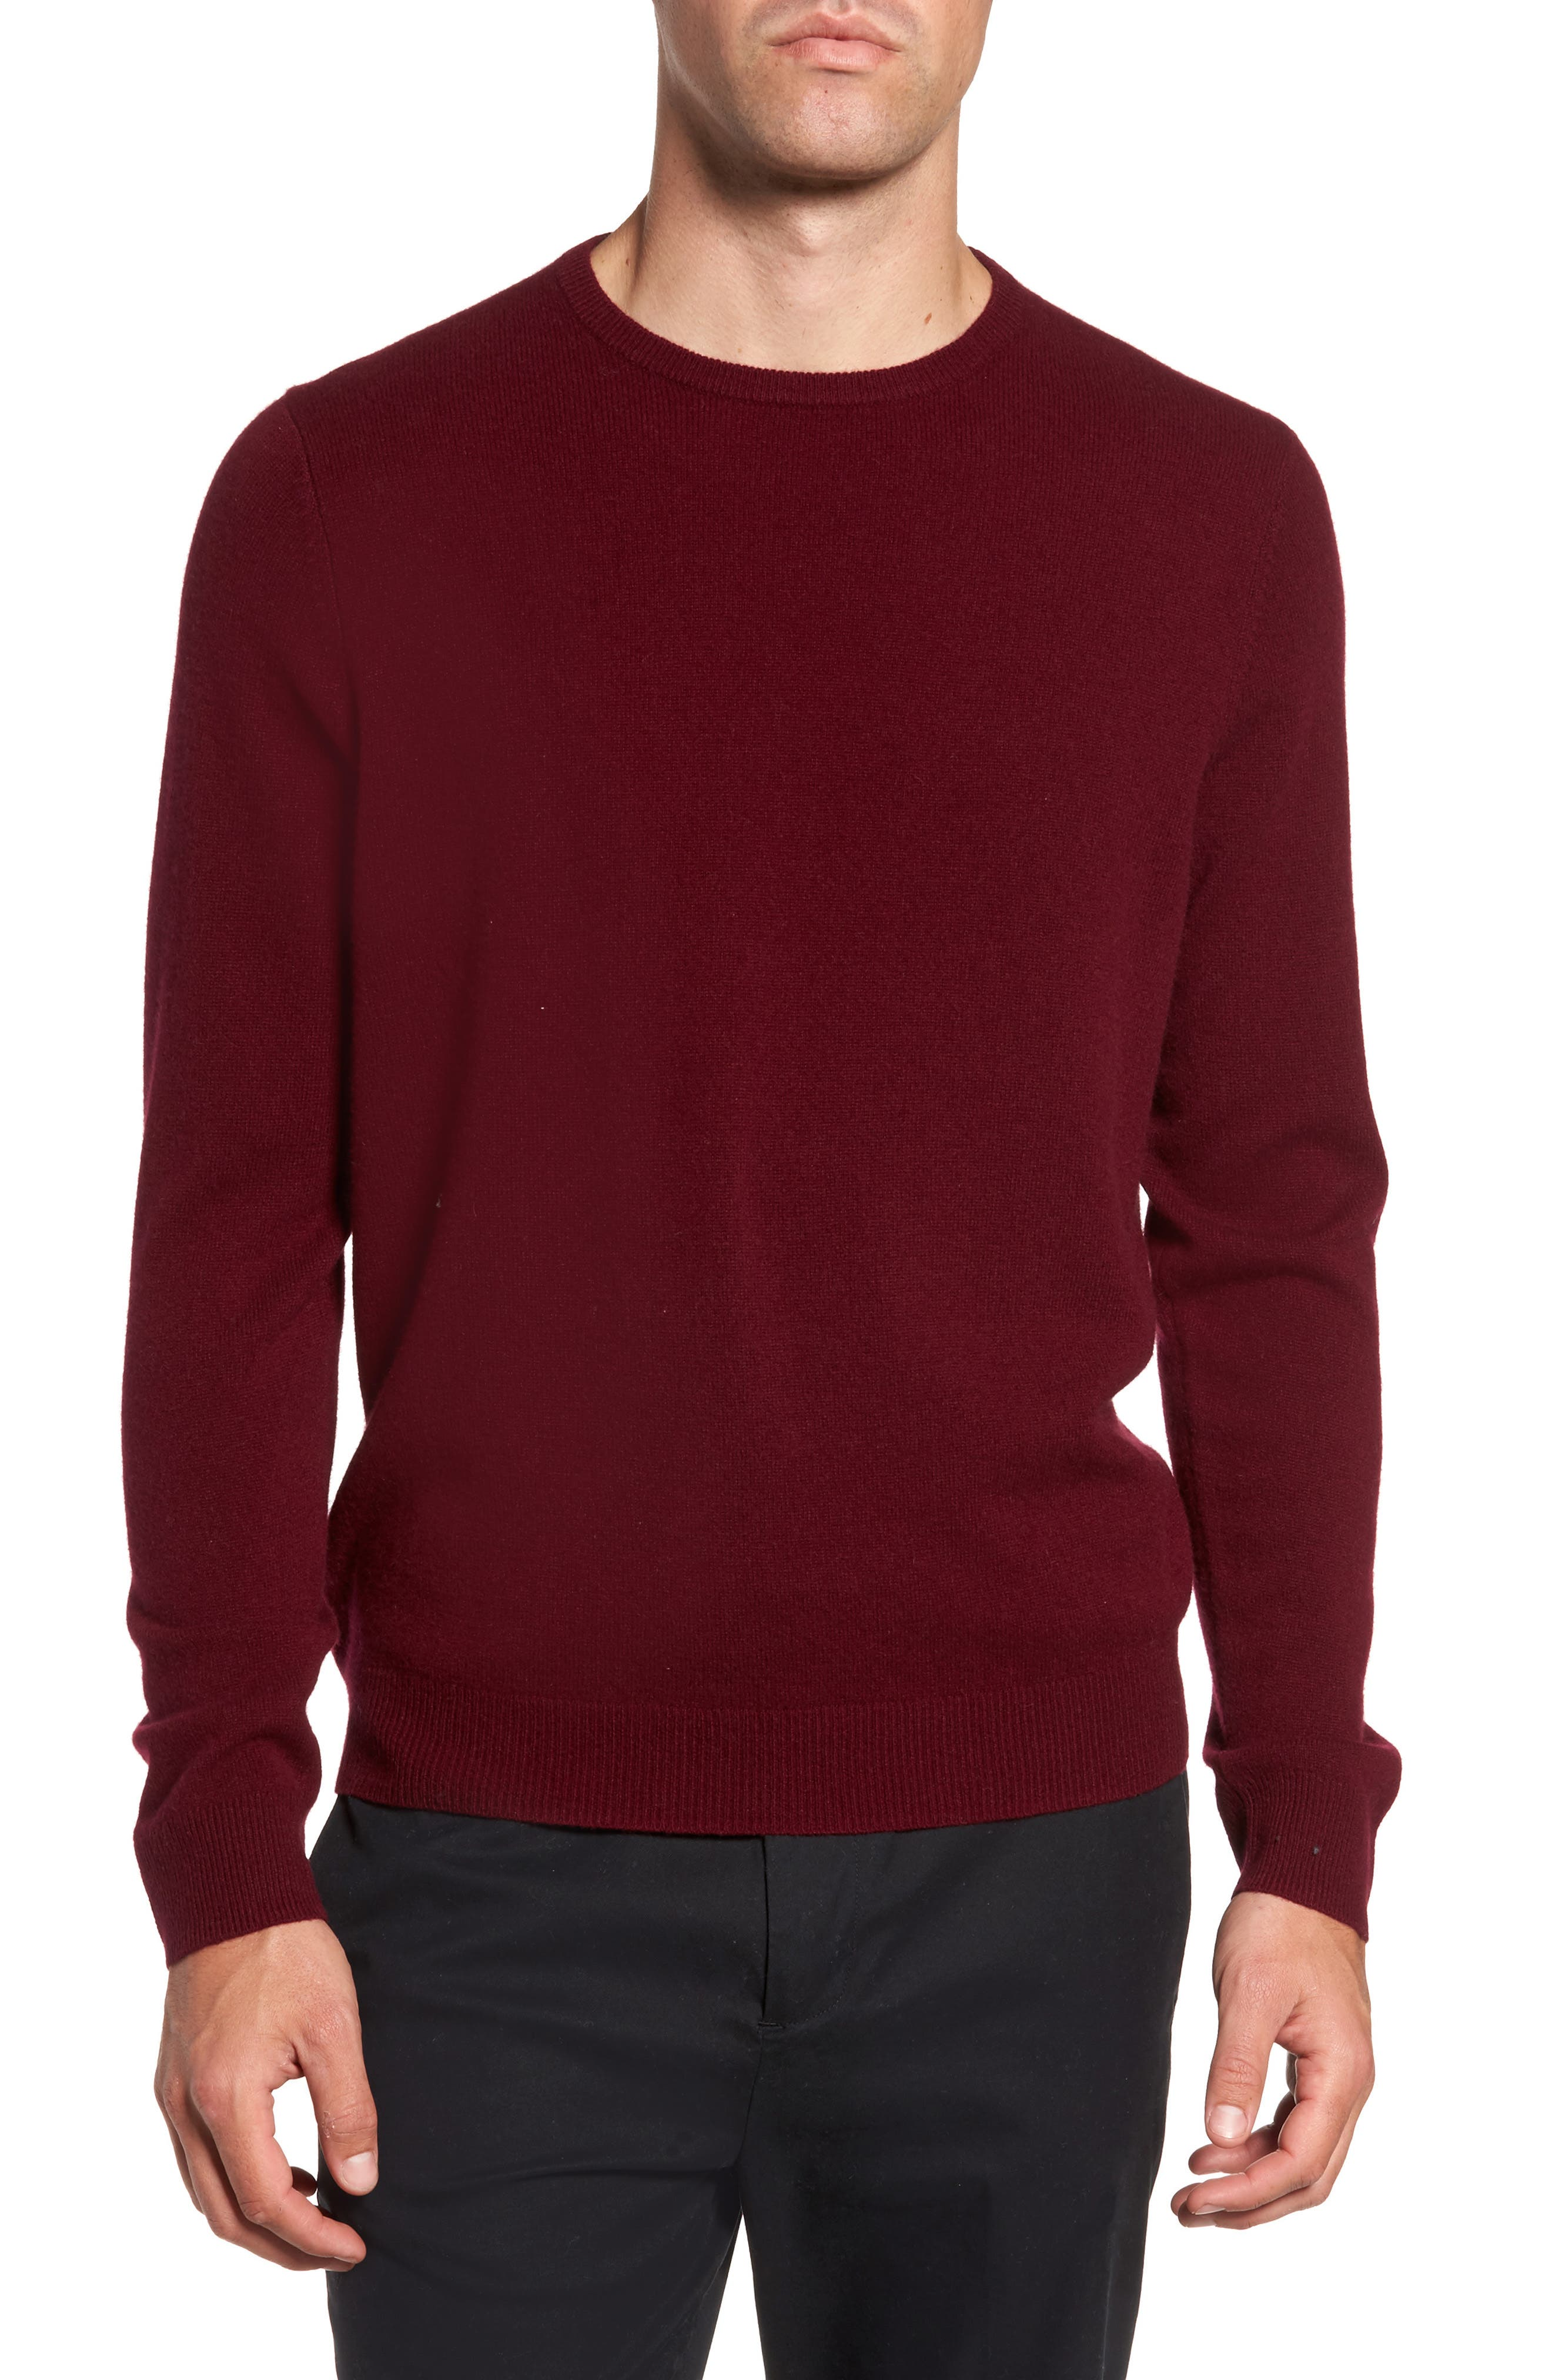 Cashmere Crewneck Sweater,                         Main,                         color, Burgundy London